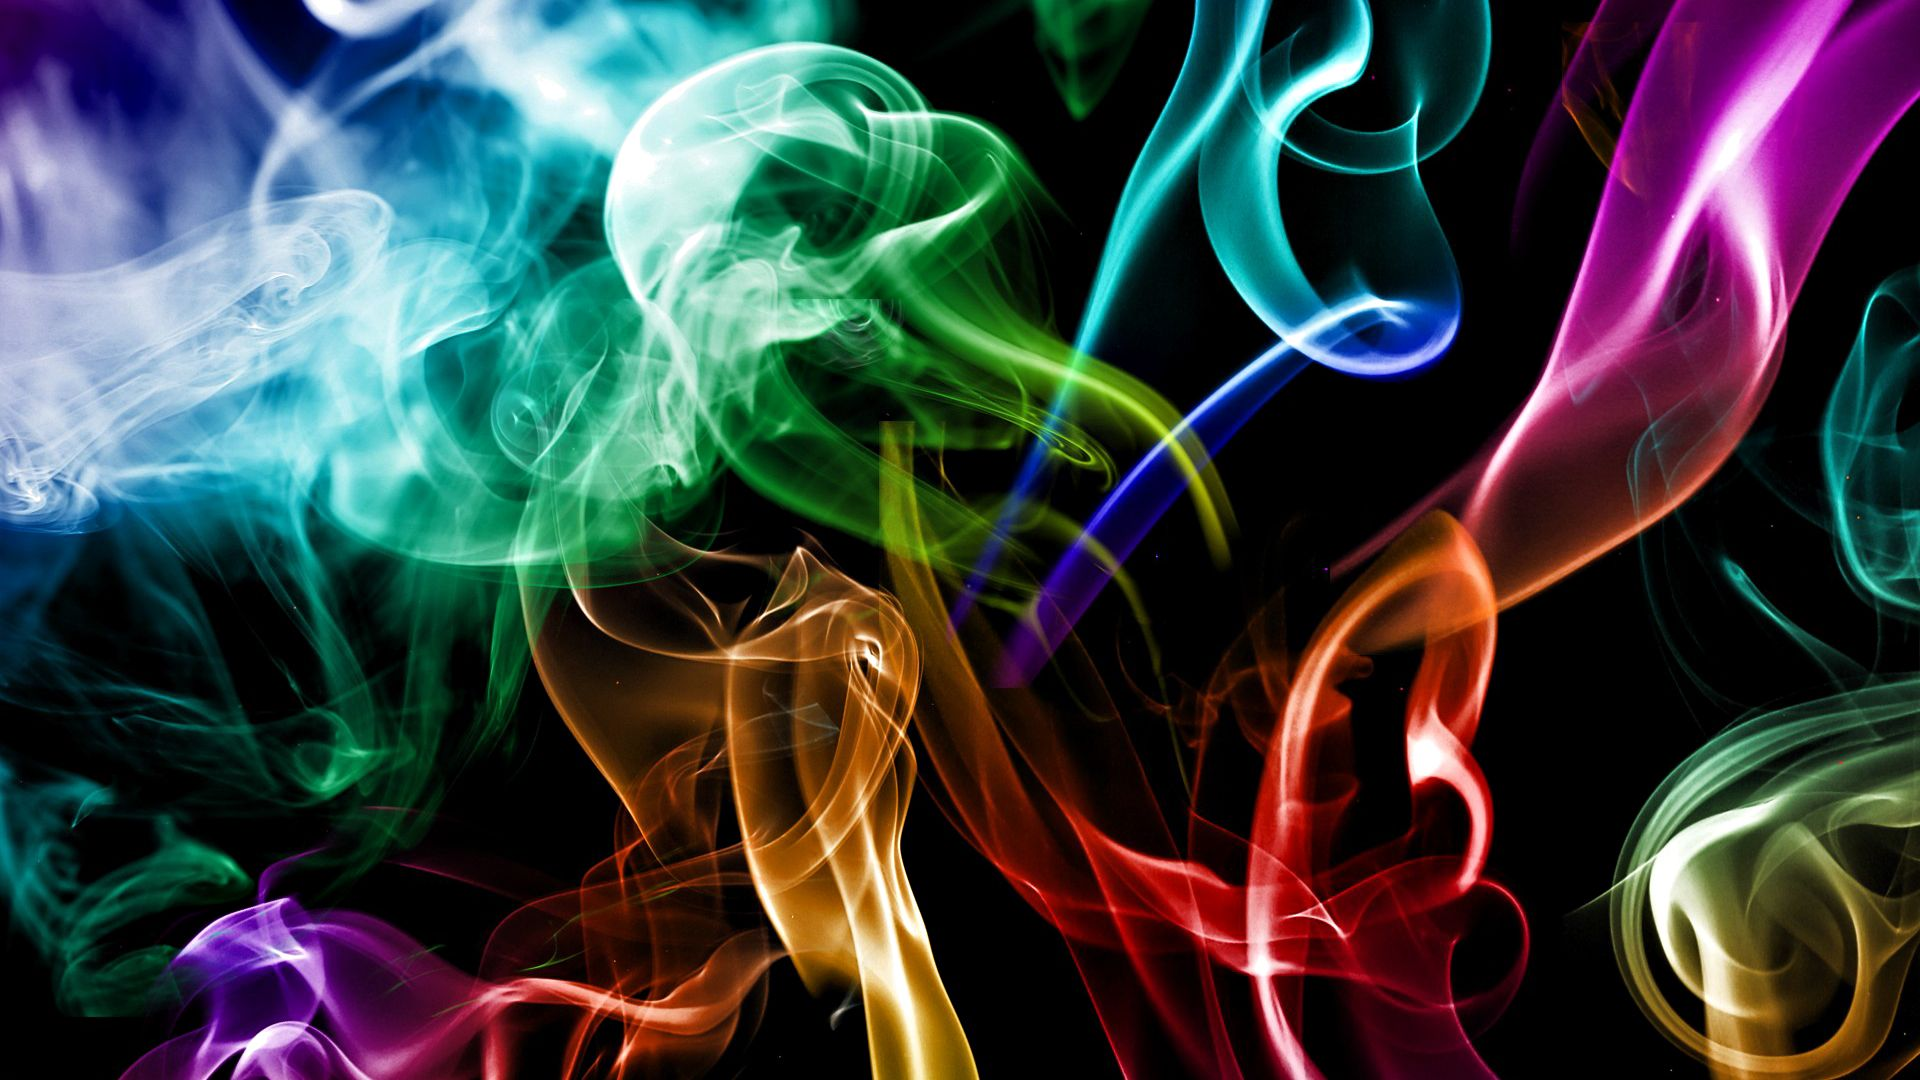 Download Smoke Wallpaper, Multicolored Smoke